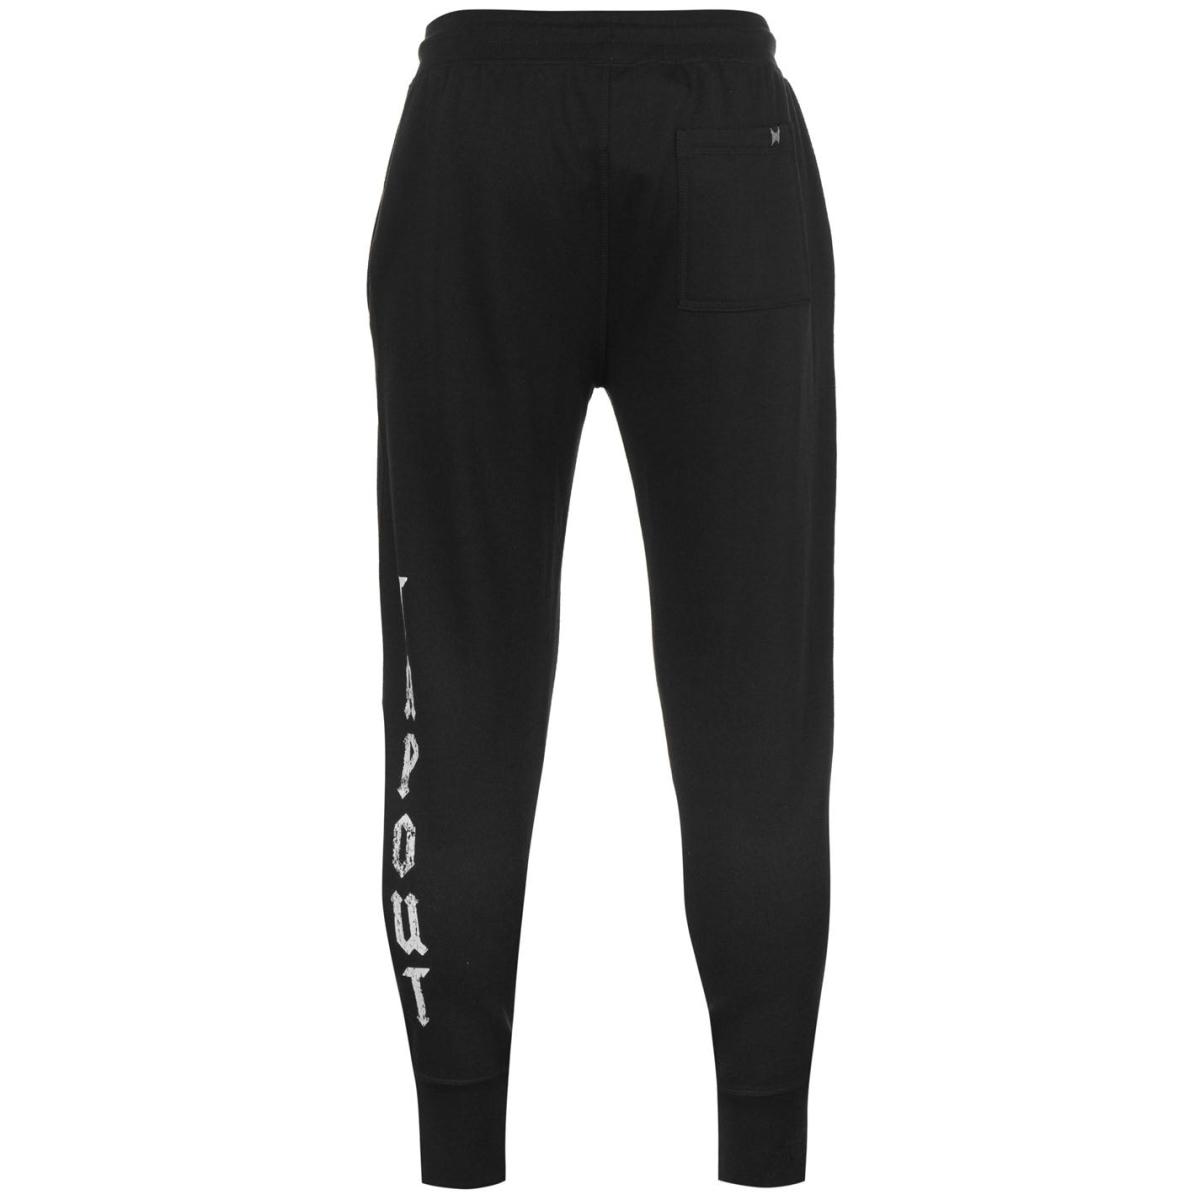 Tapout Training pantalones pantalones deportivos pantalones de deporte caballero pantalones Fitness Core 8251